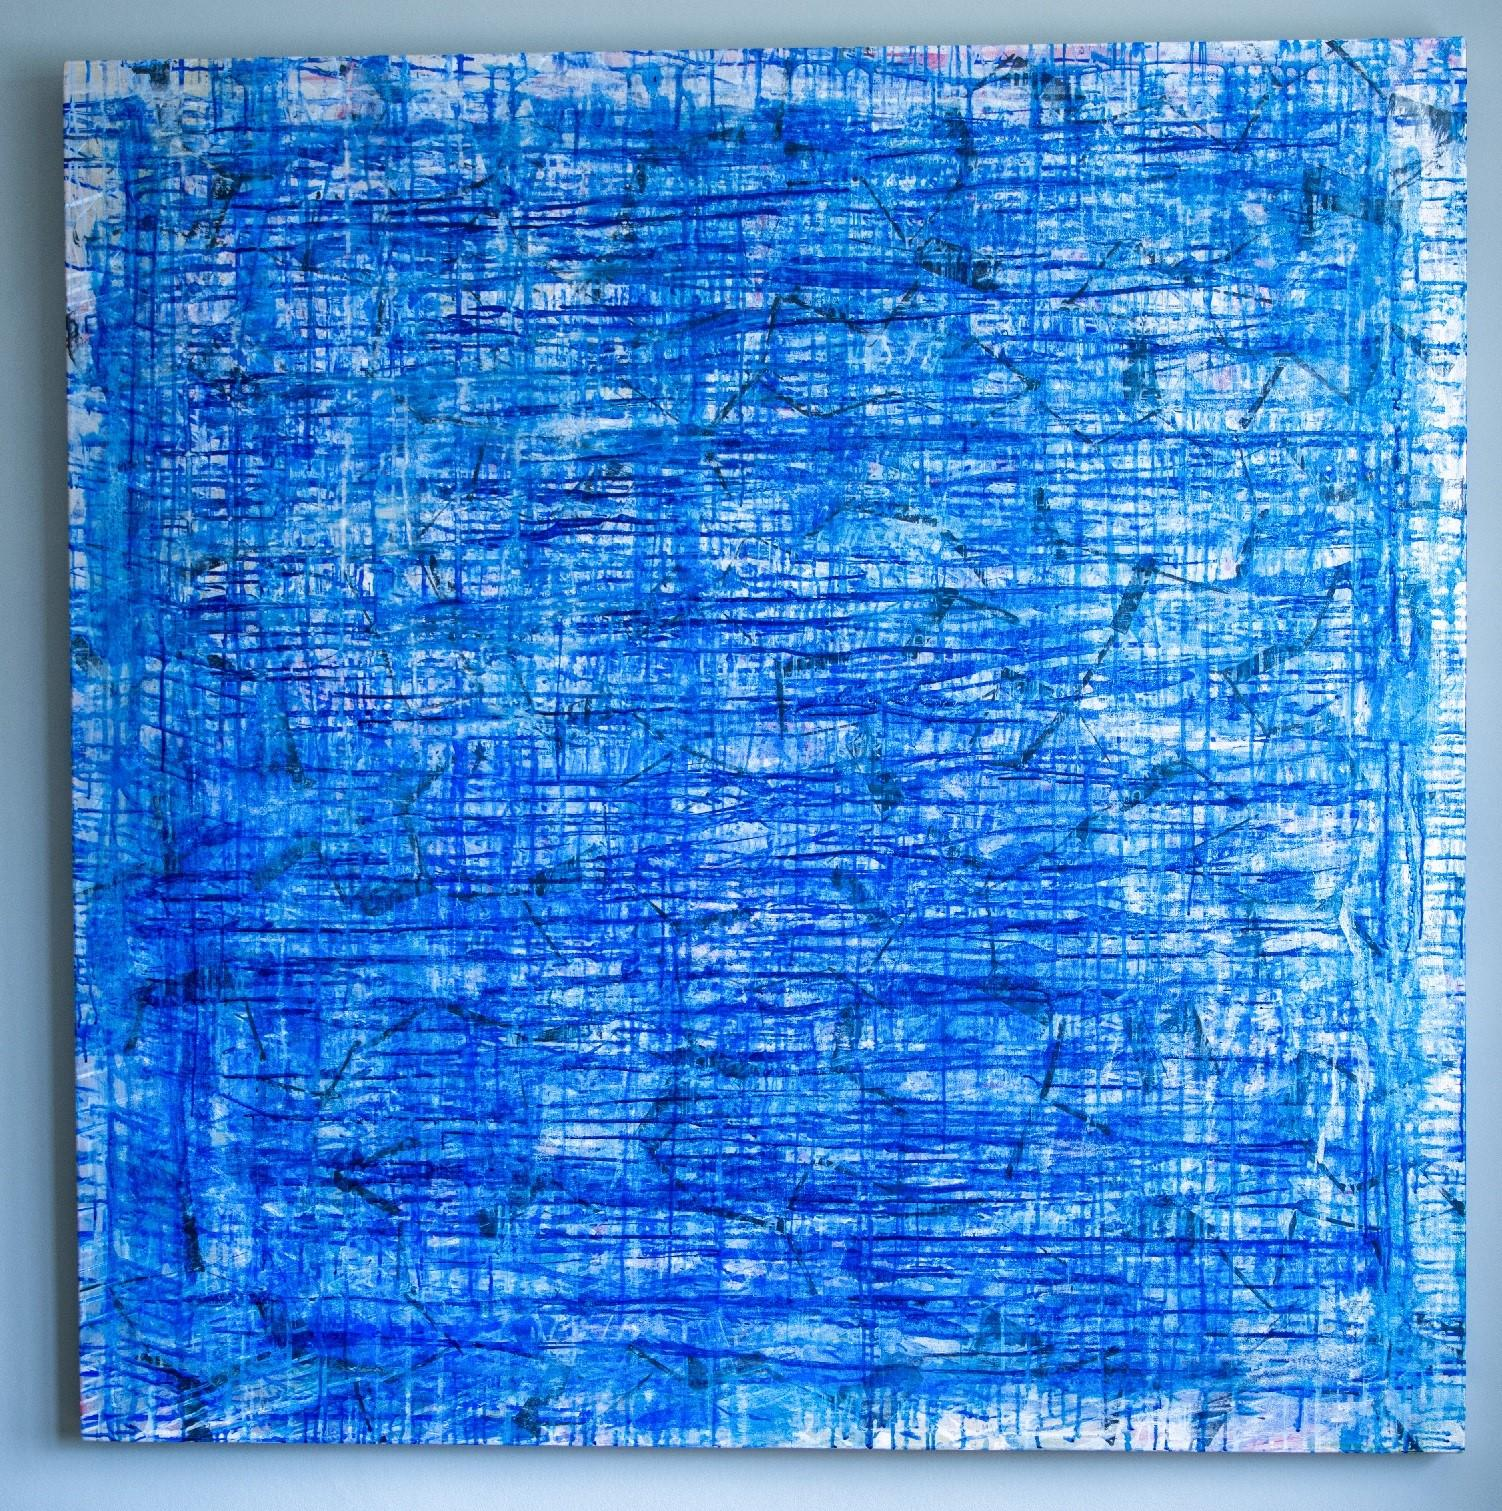 Deep Sea - Monroe Hodder, American, Abstract, Juxtapositions, Bold, Modern, Blue